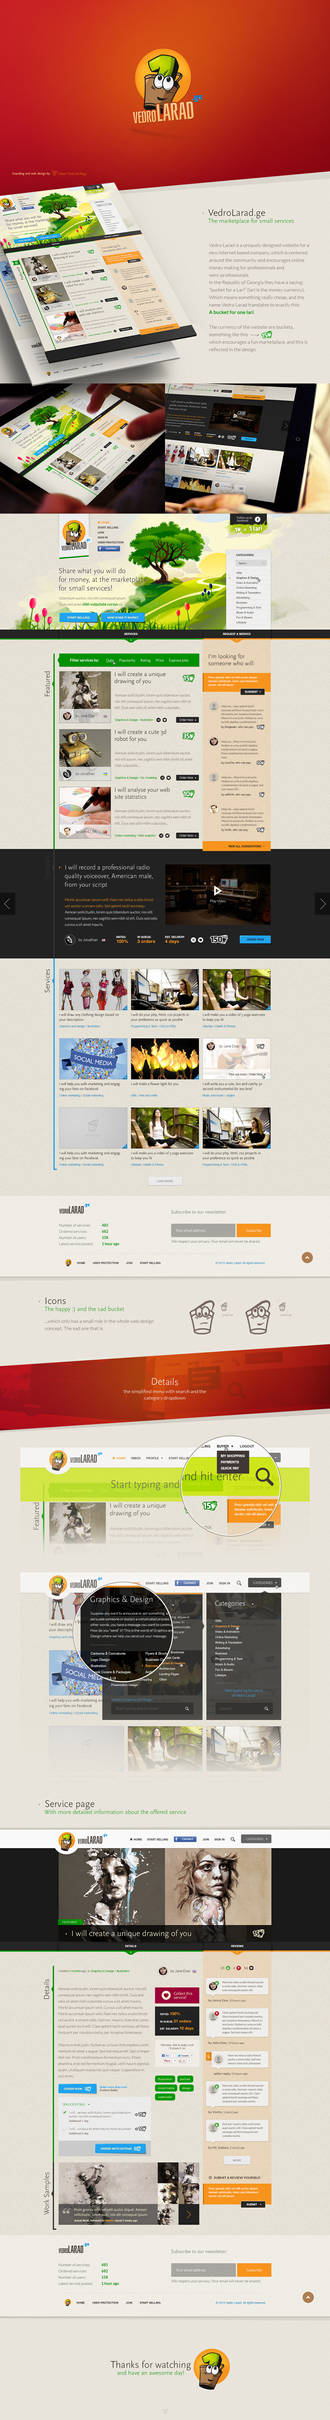 Branding and Web Design - Vedro Larad